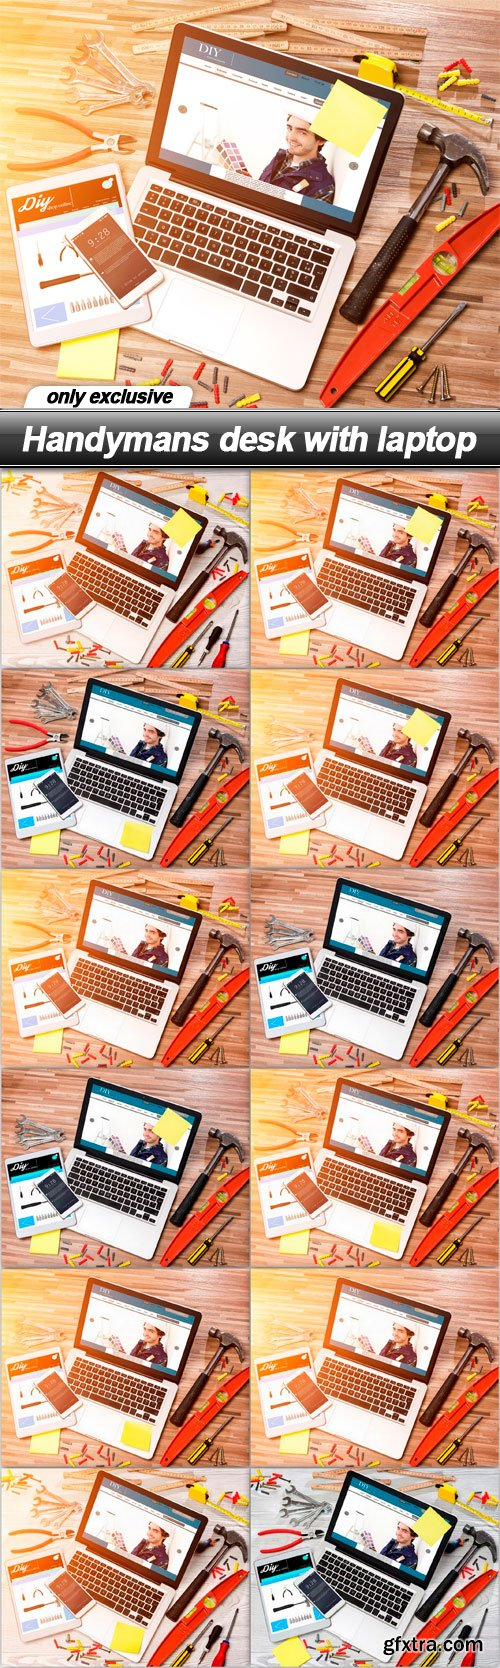 Handymans desk with laptop - 12 UHQ JPEG